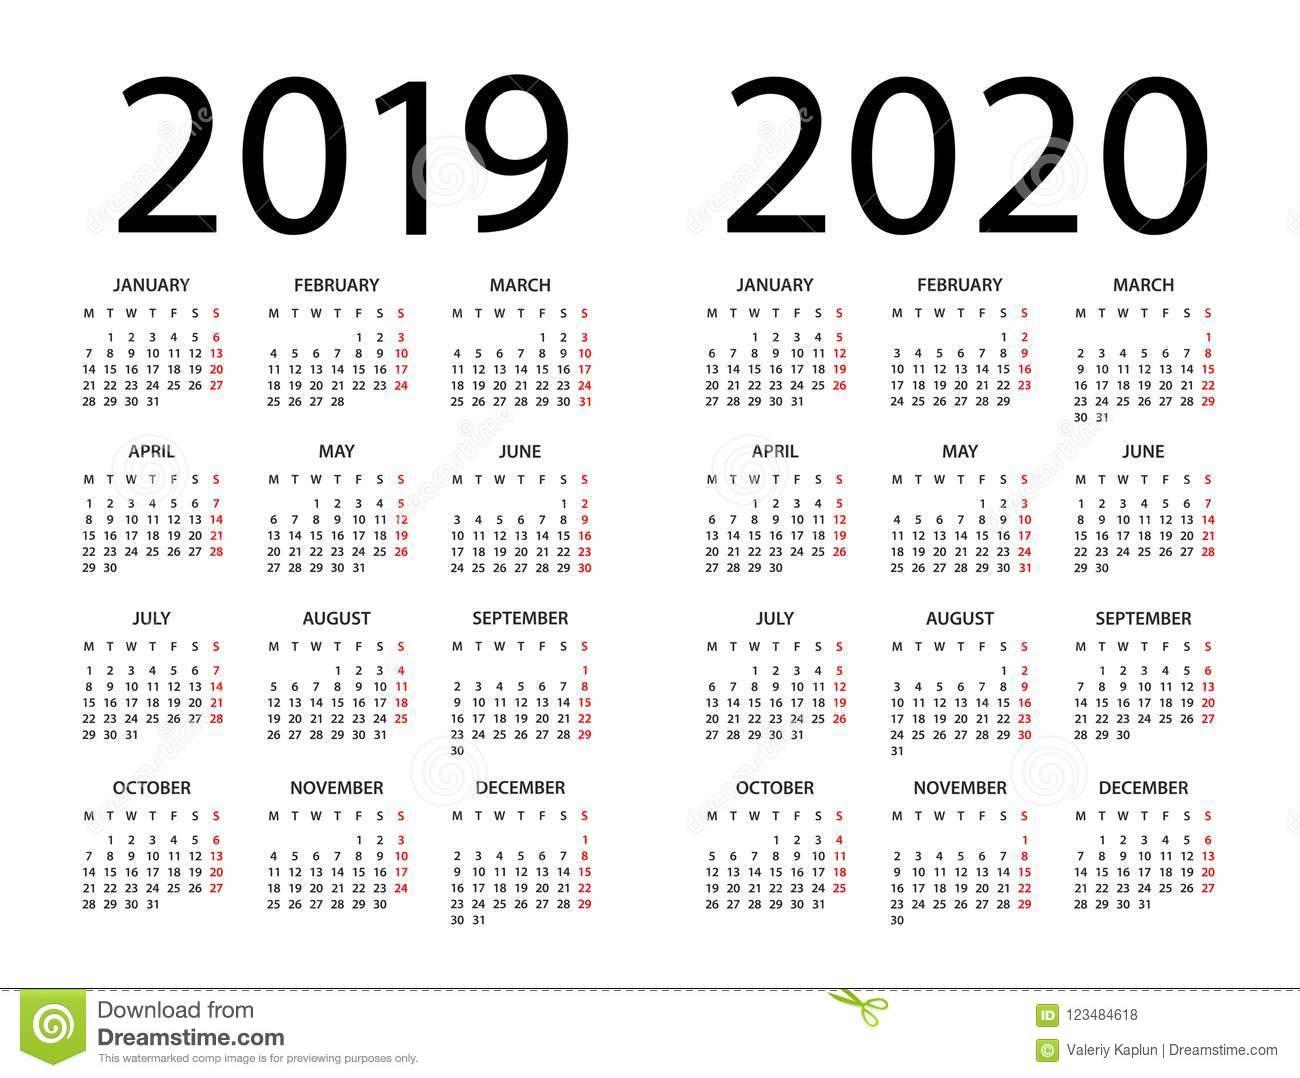 Календарь 2019 2020  Иллюстрация Старты Недели На within Kalendar Kuda September 2020